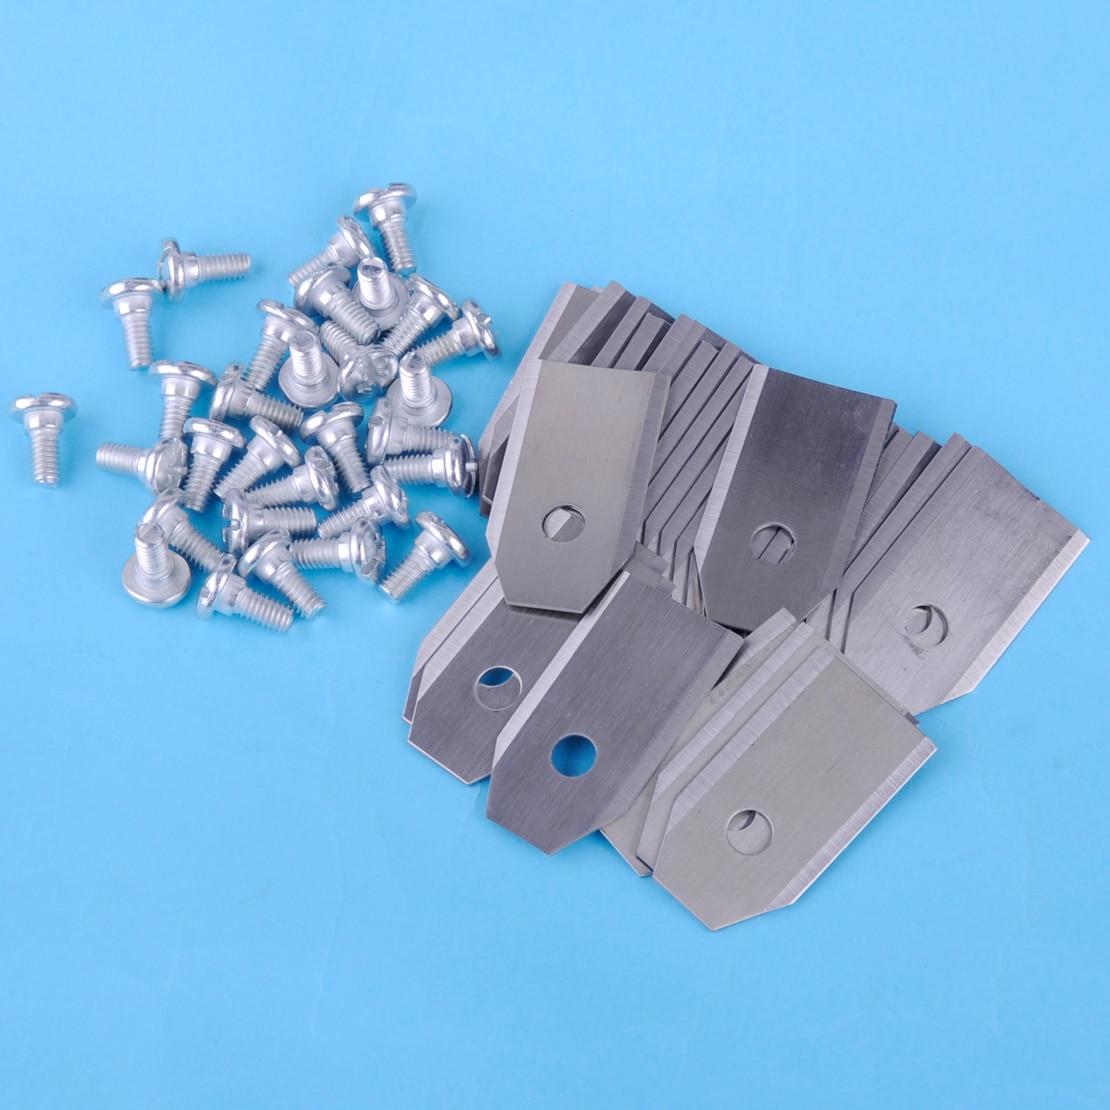 Letaosk 18x0.75mm cortador de grama lâmina auto apto para husqvarna 305 308 310 220ac 265acx gardena acessórios